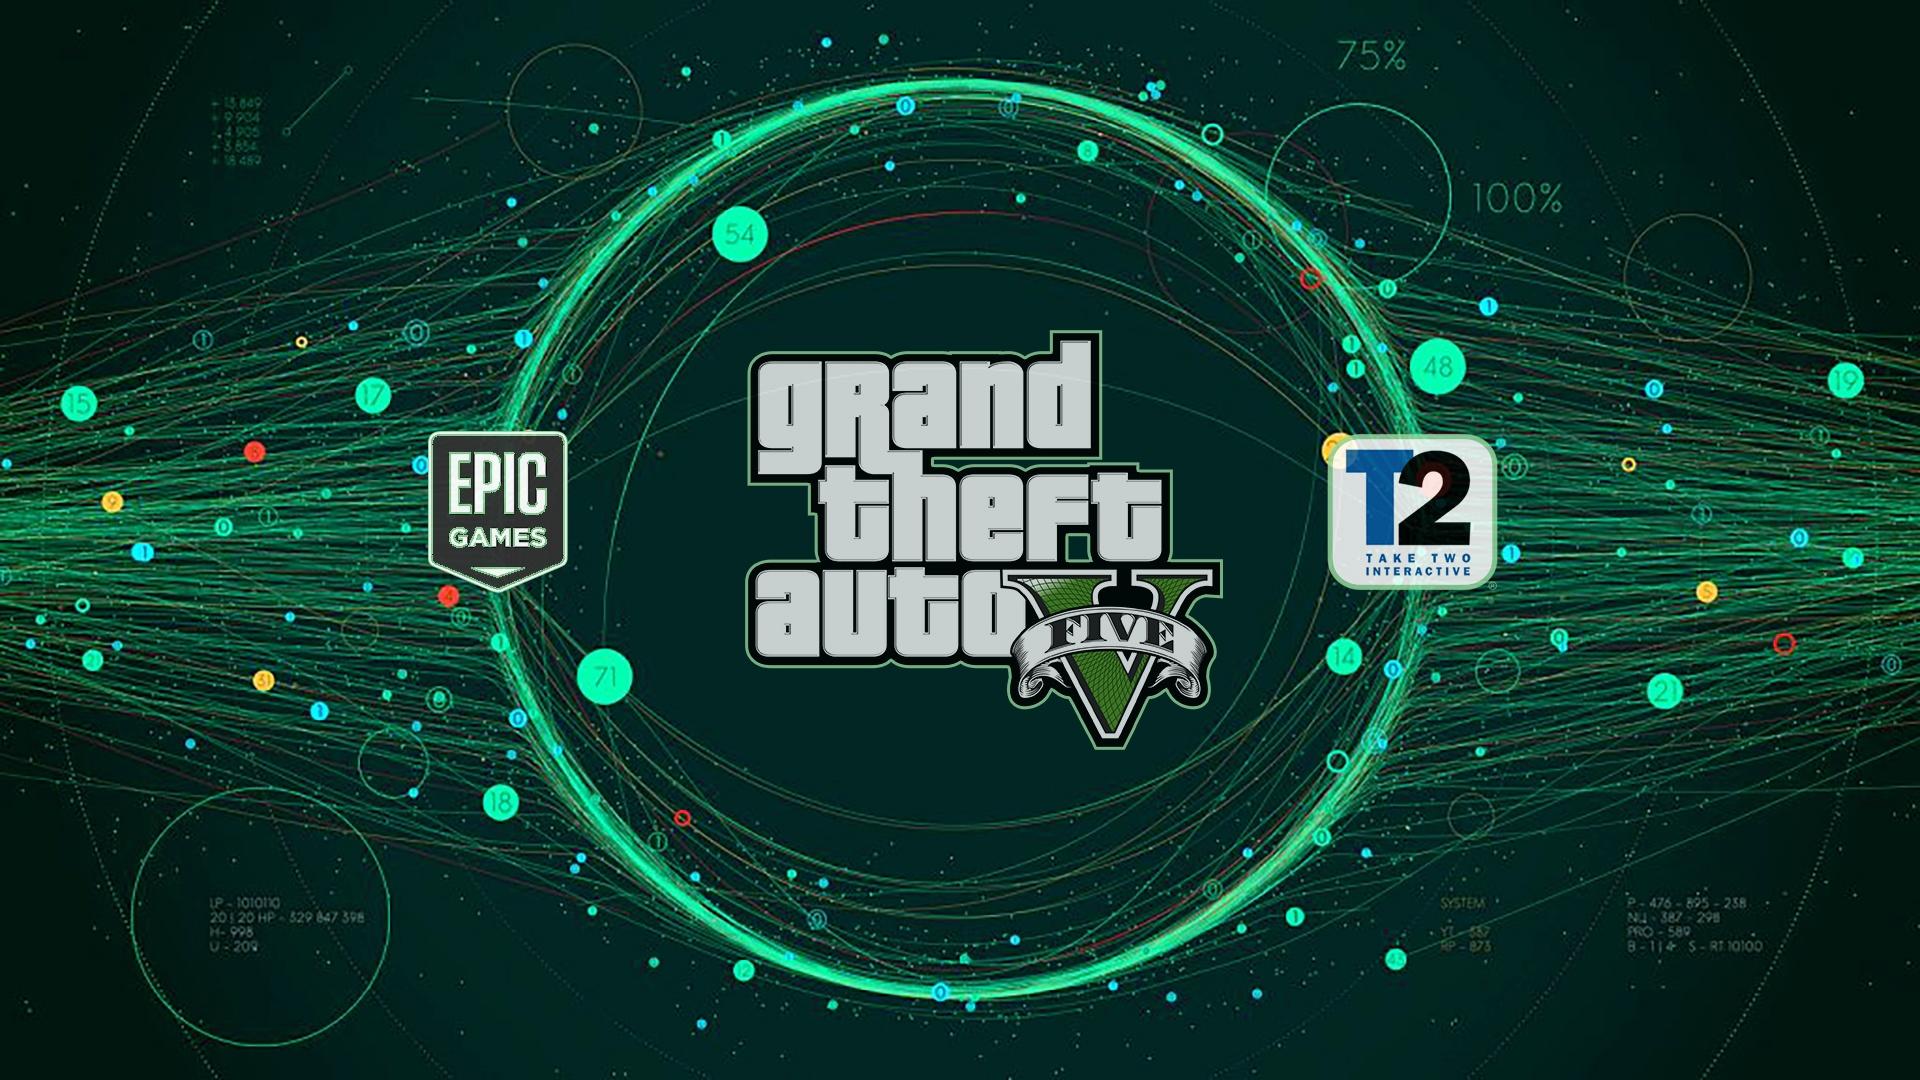 L'Epic Games Sorte cartonne grâce à GTA V